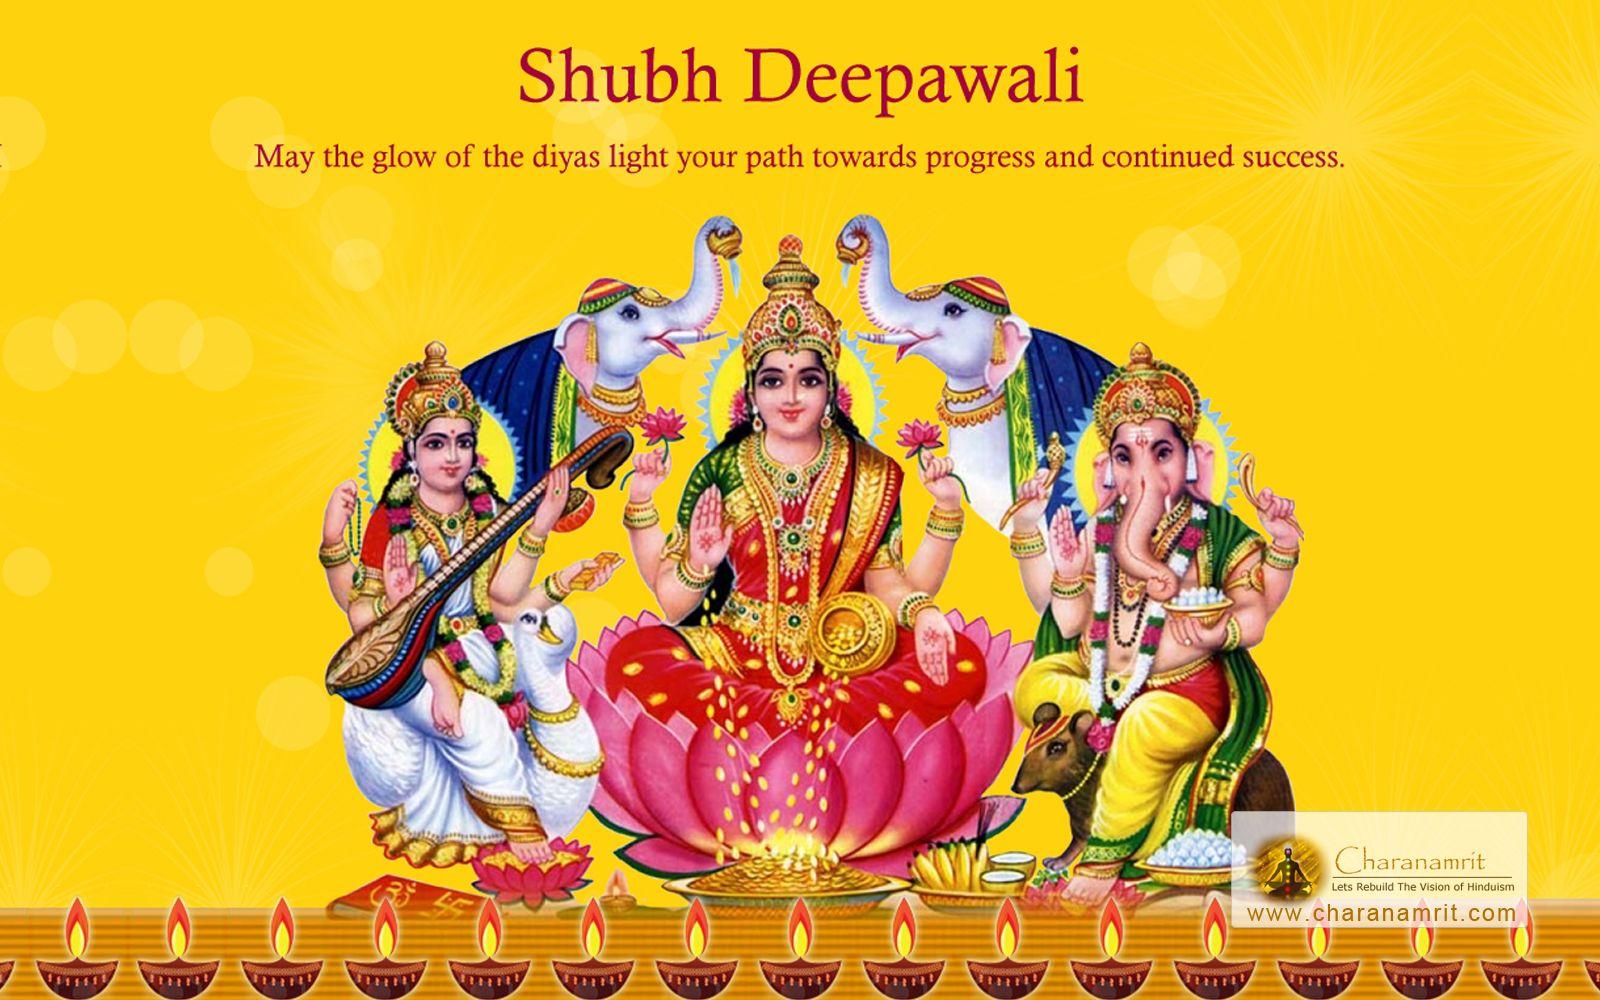 images of laxmi & ganesh in hd for diwali